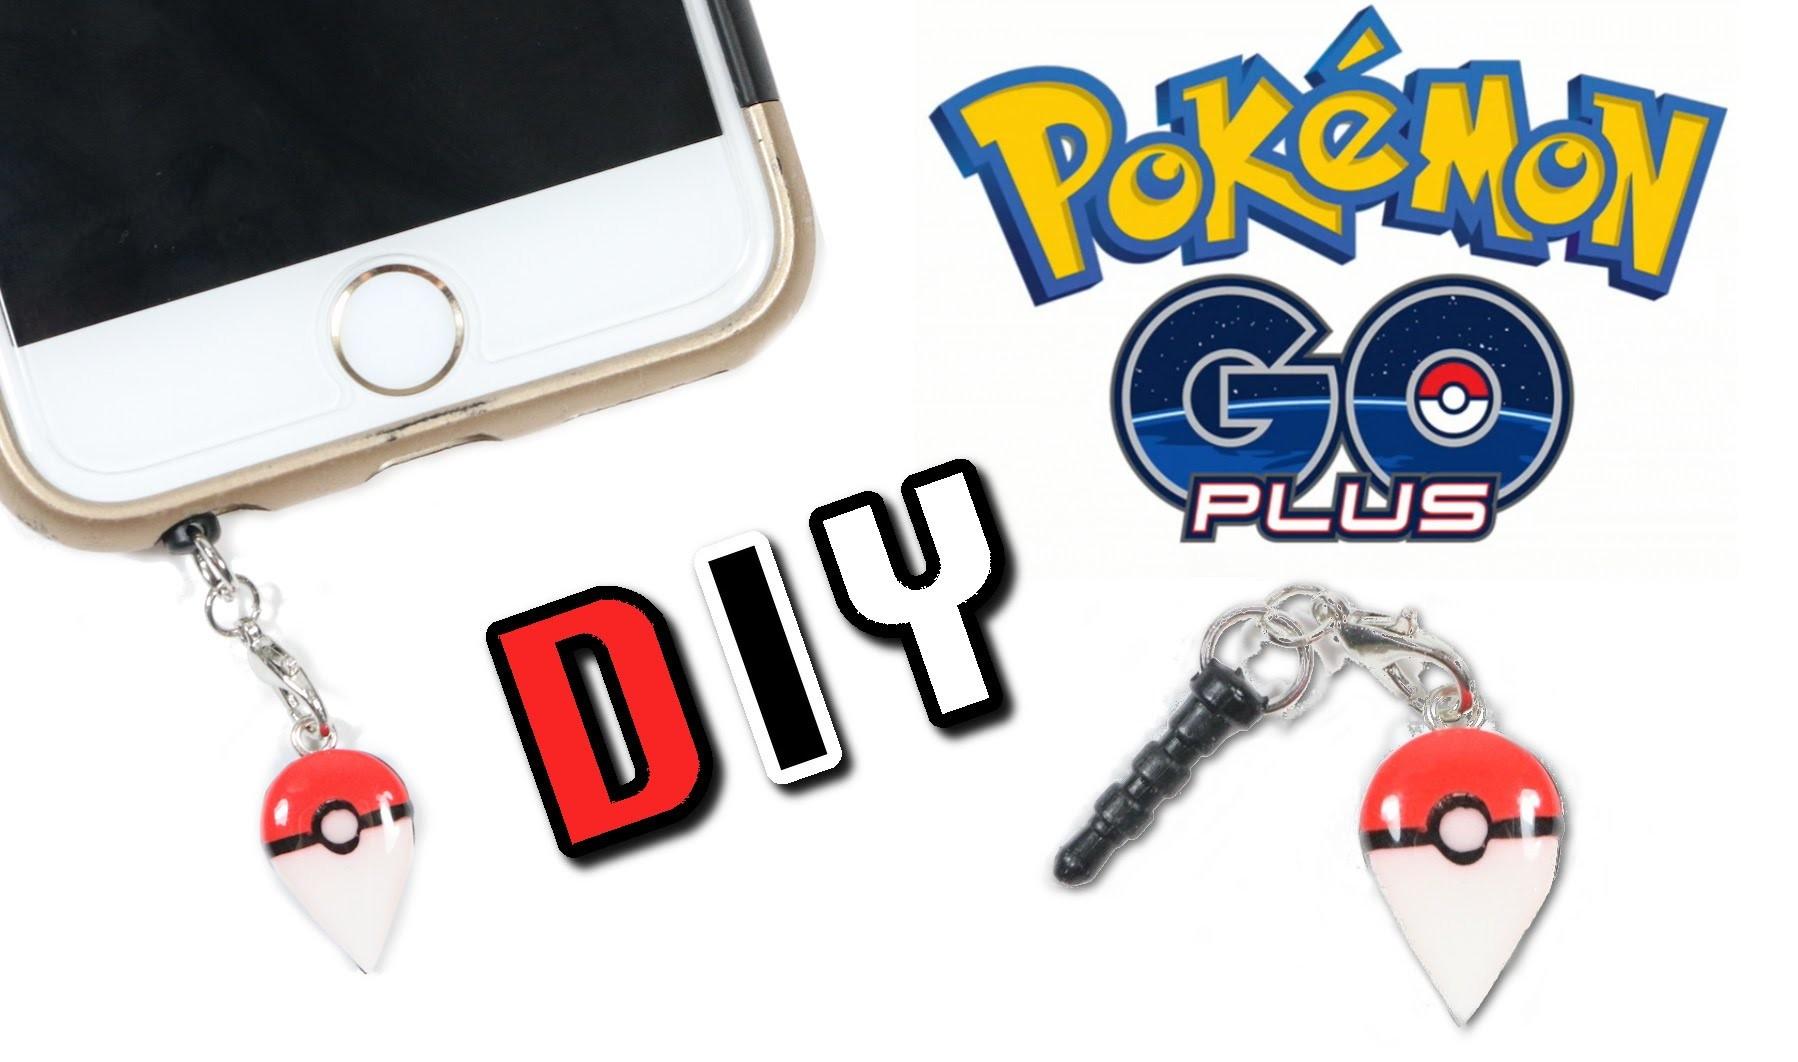 How to make DIY Pokemon Go Plus Accessory Clay Tutorial